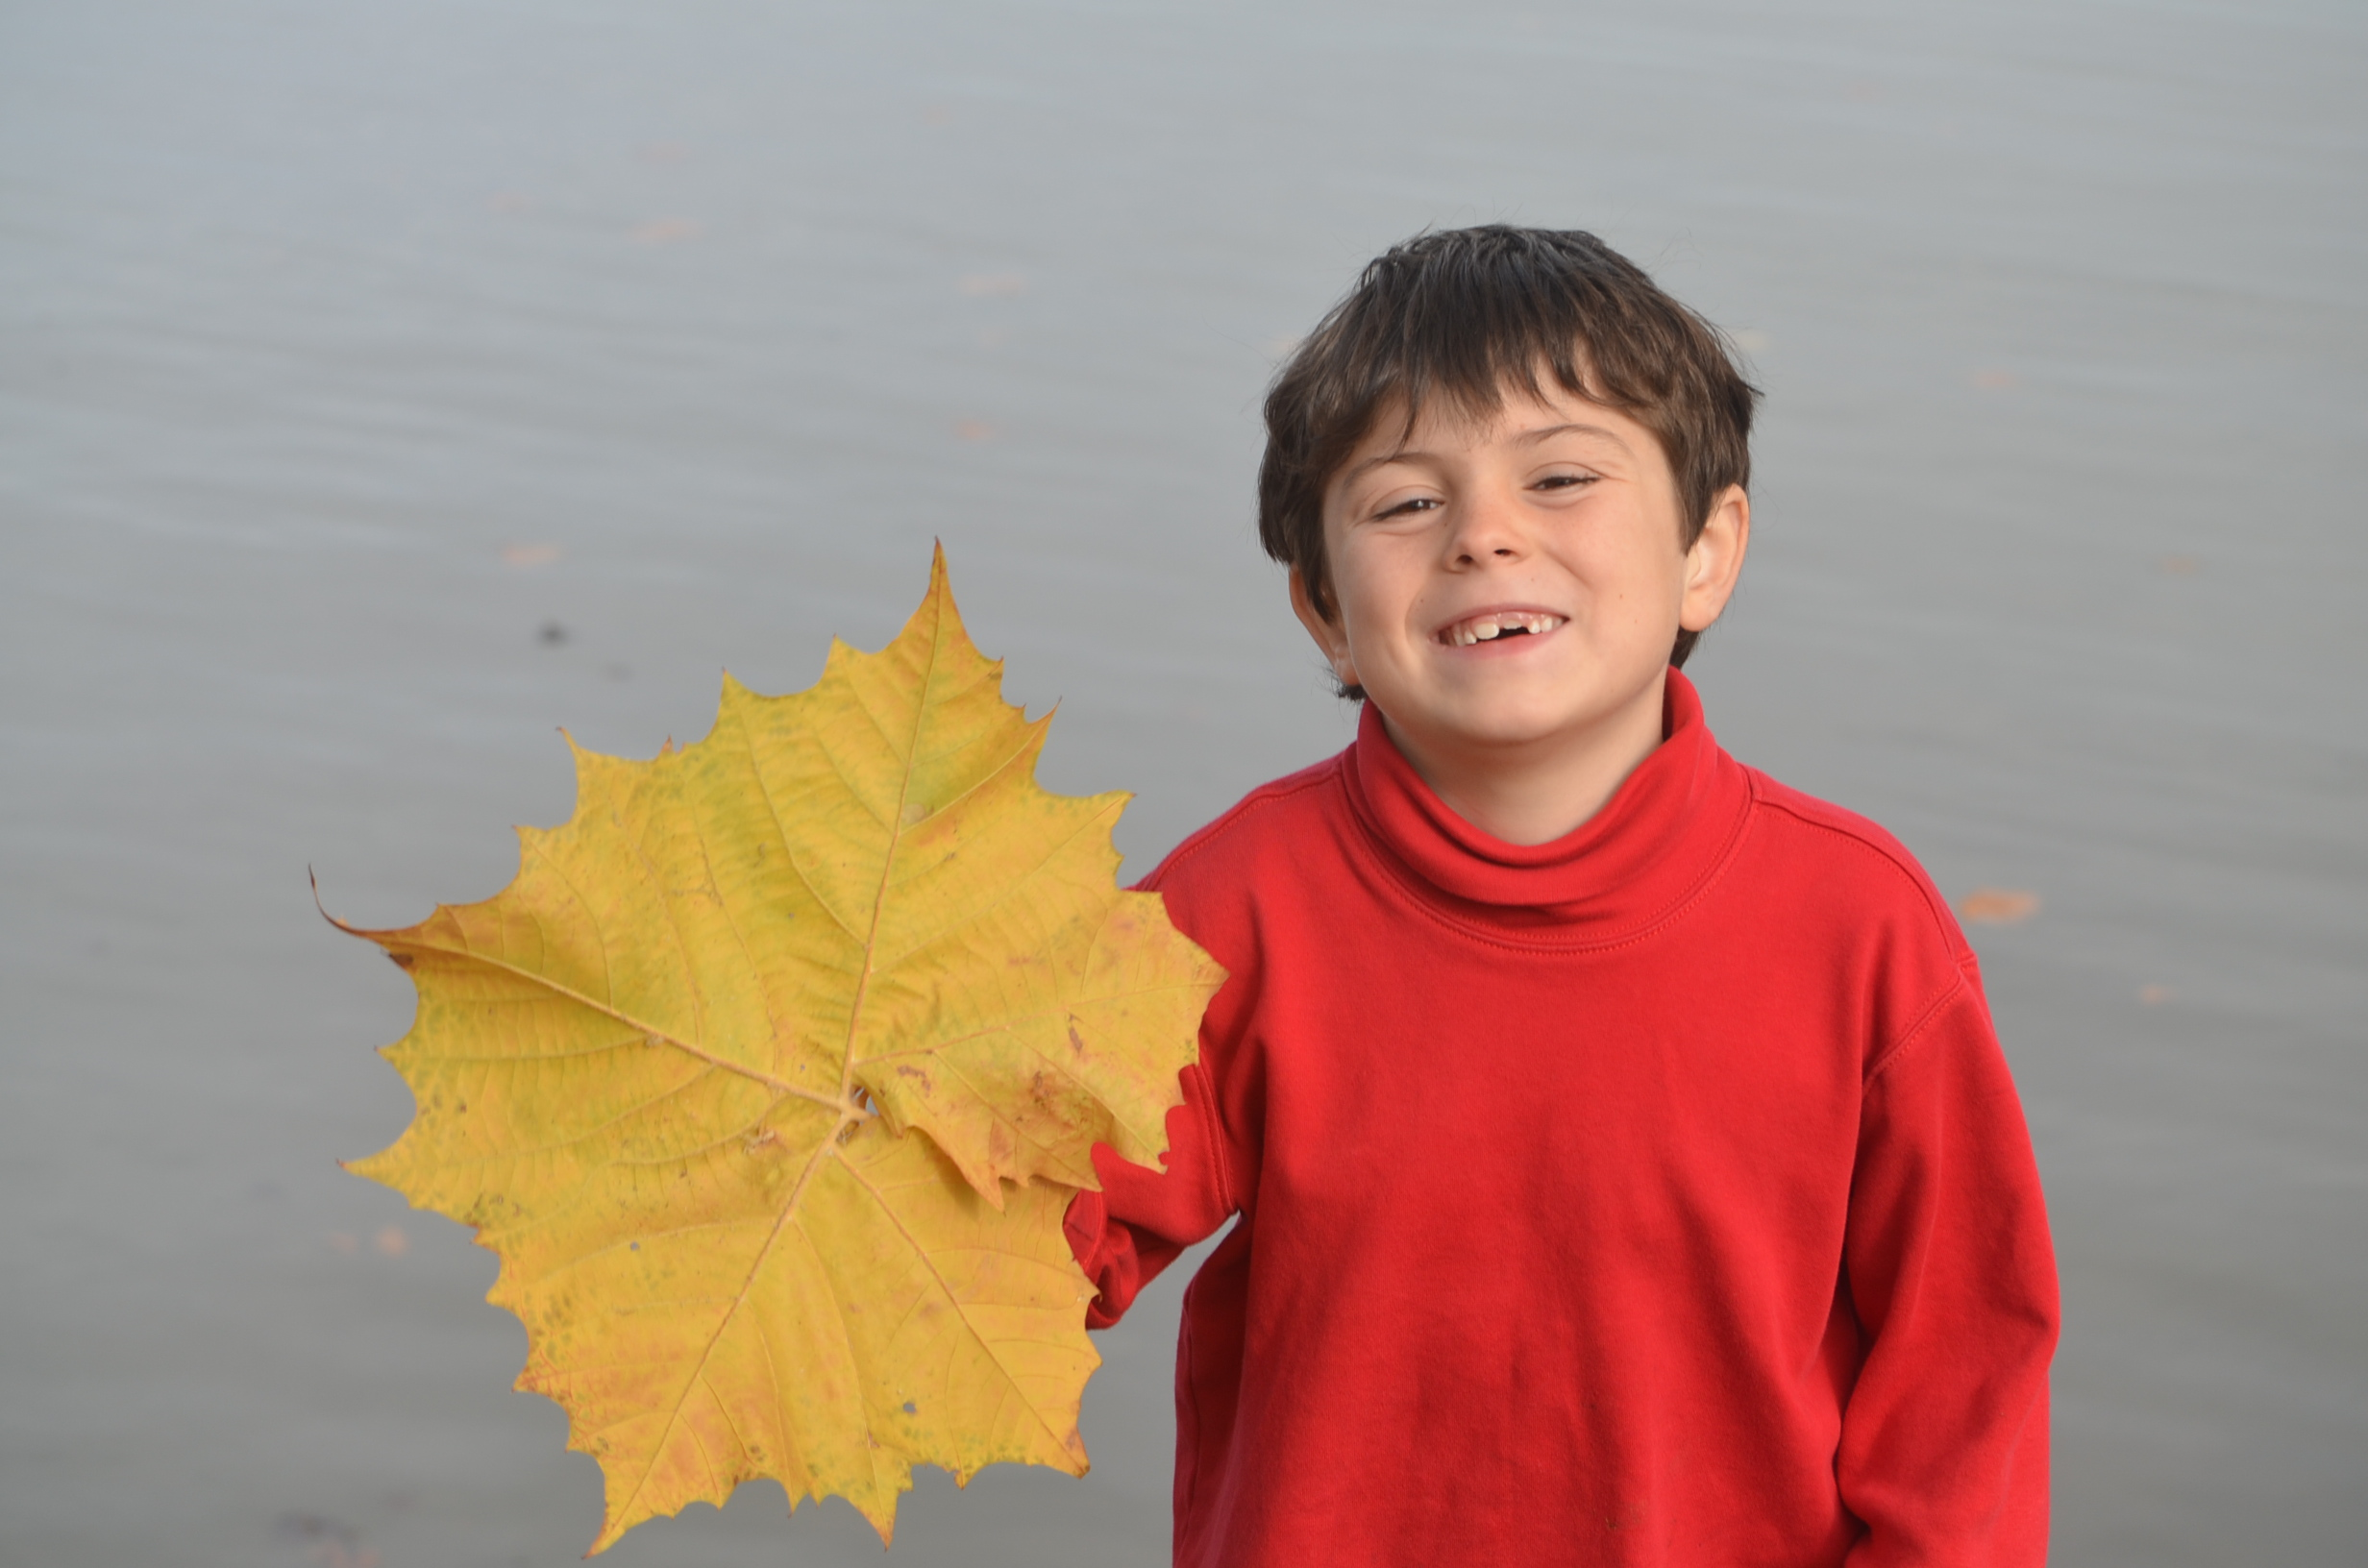 River Farm students love nature